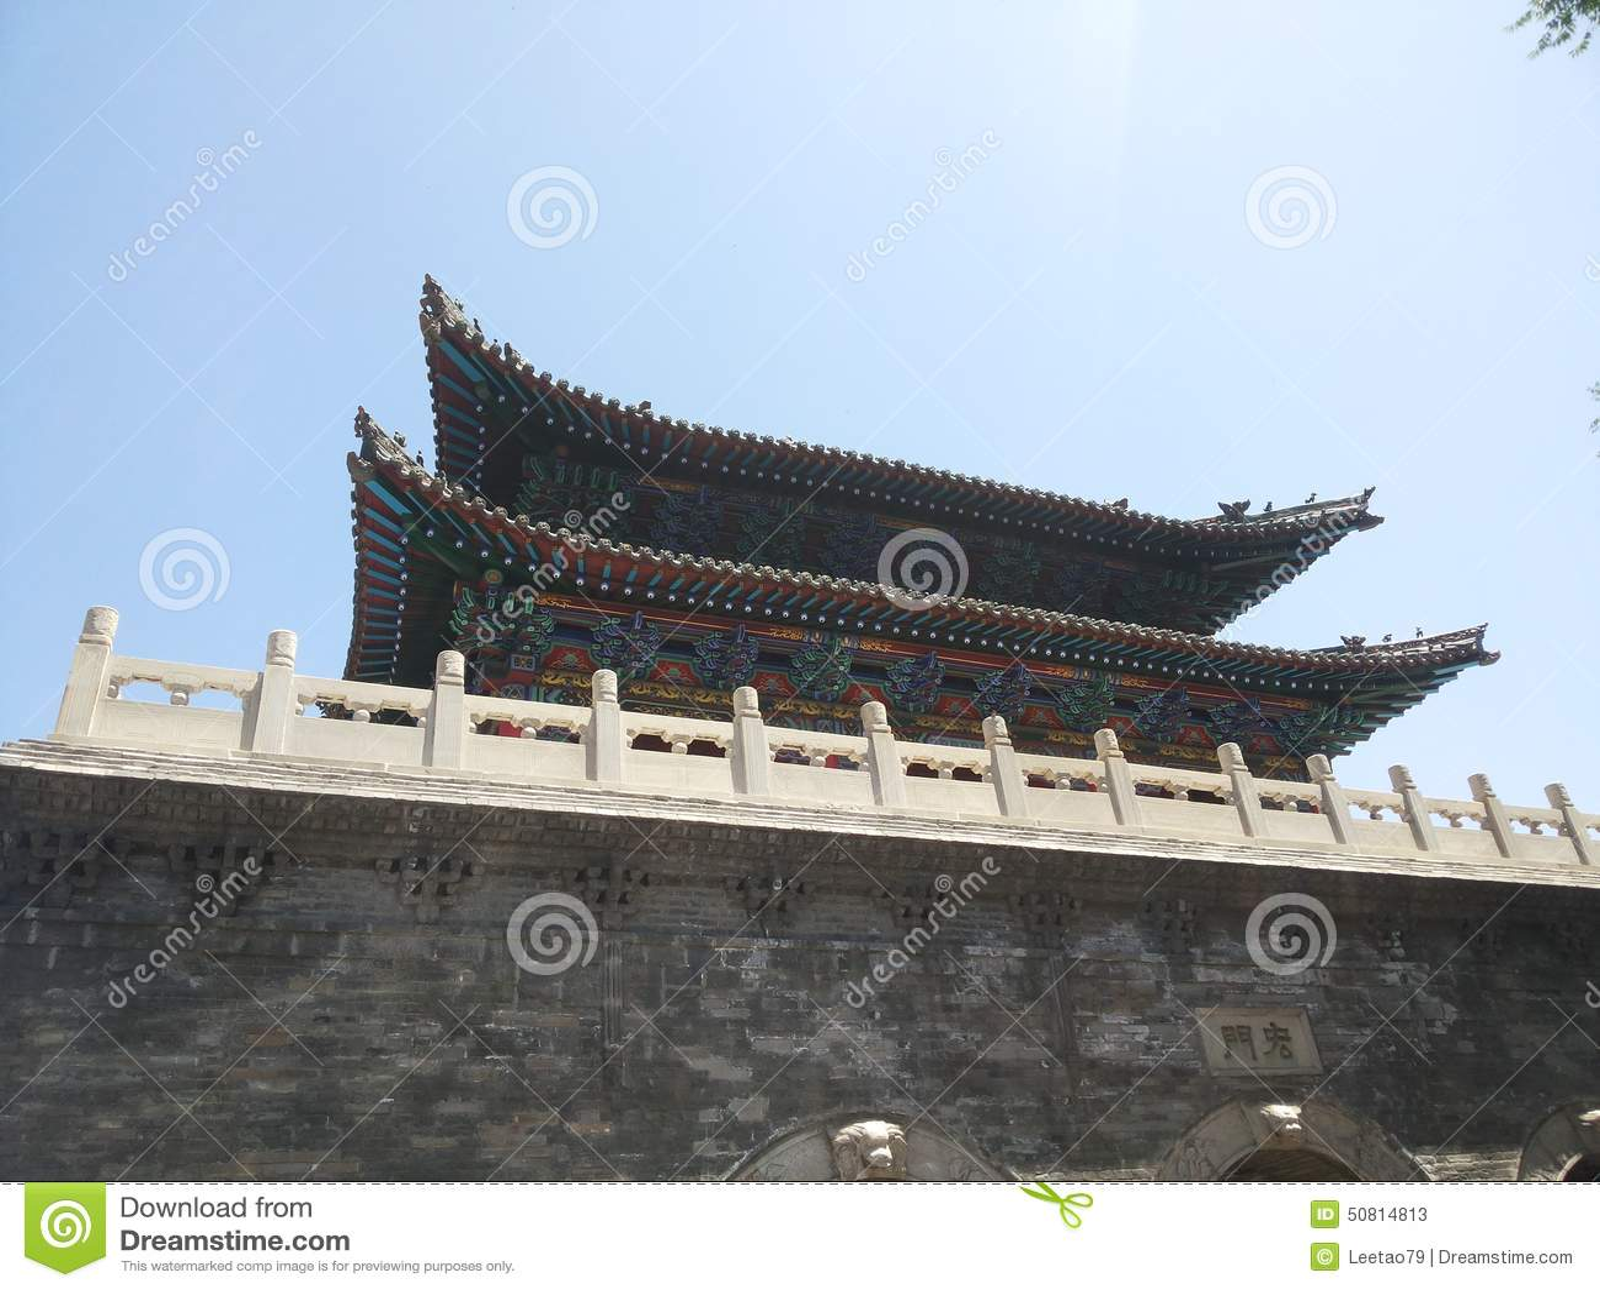 Changzhi shanxi china